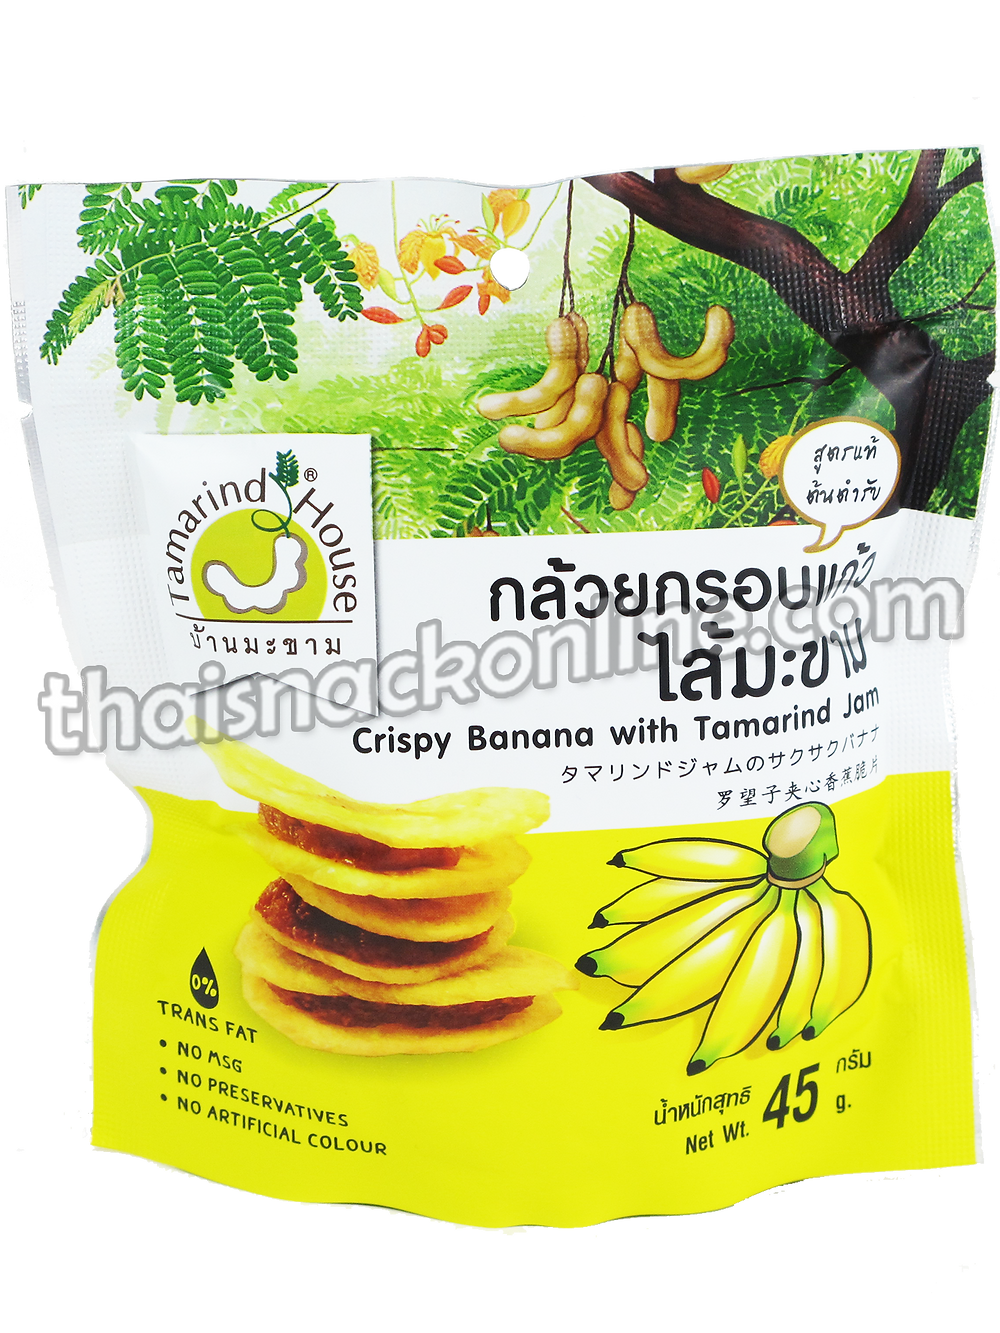 Tamarind House - Crispy Banana with Tamarind Jam